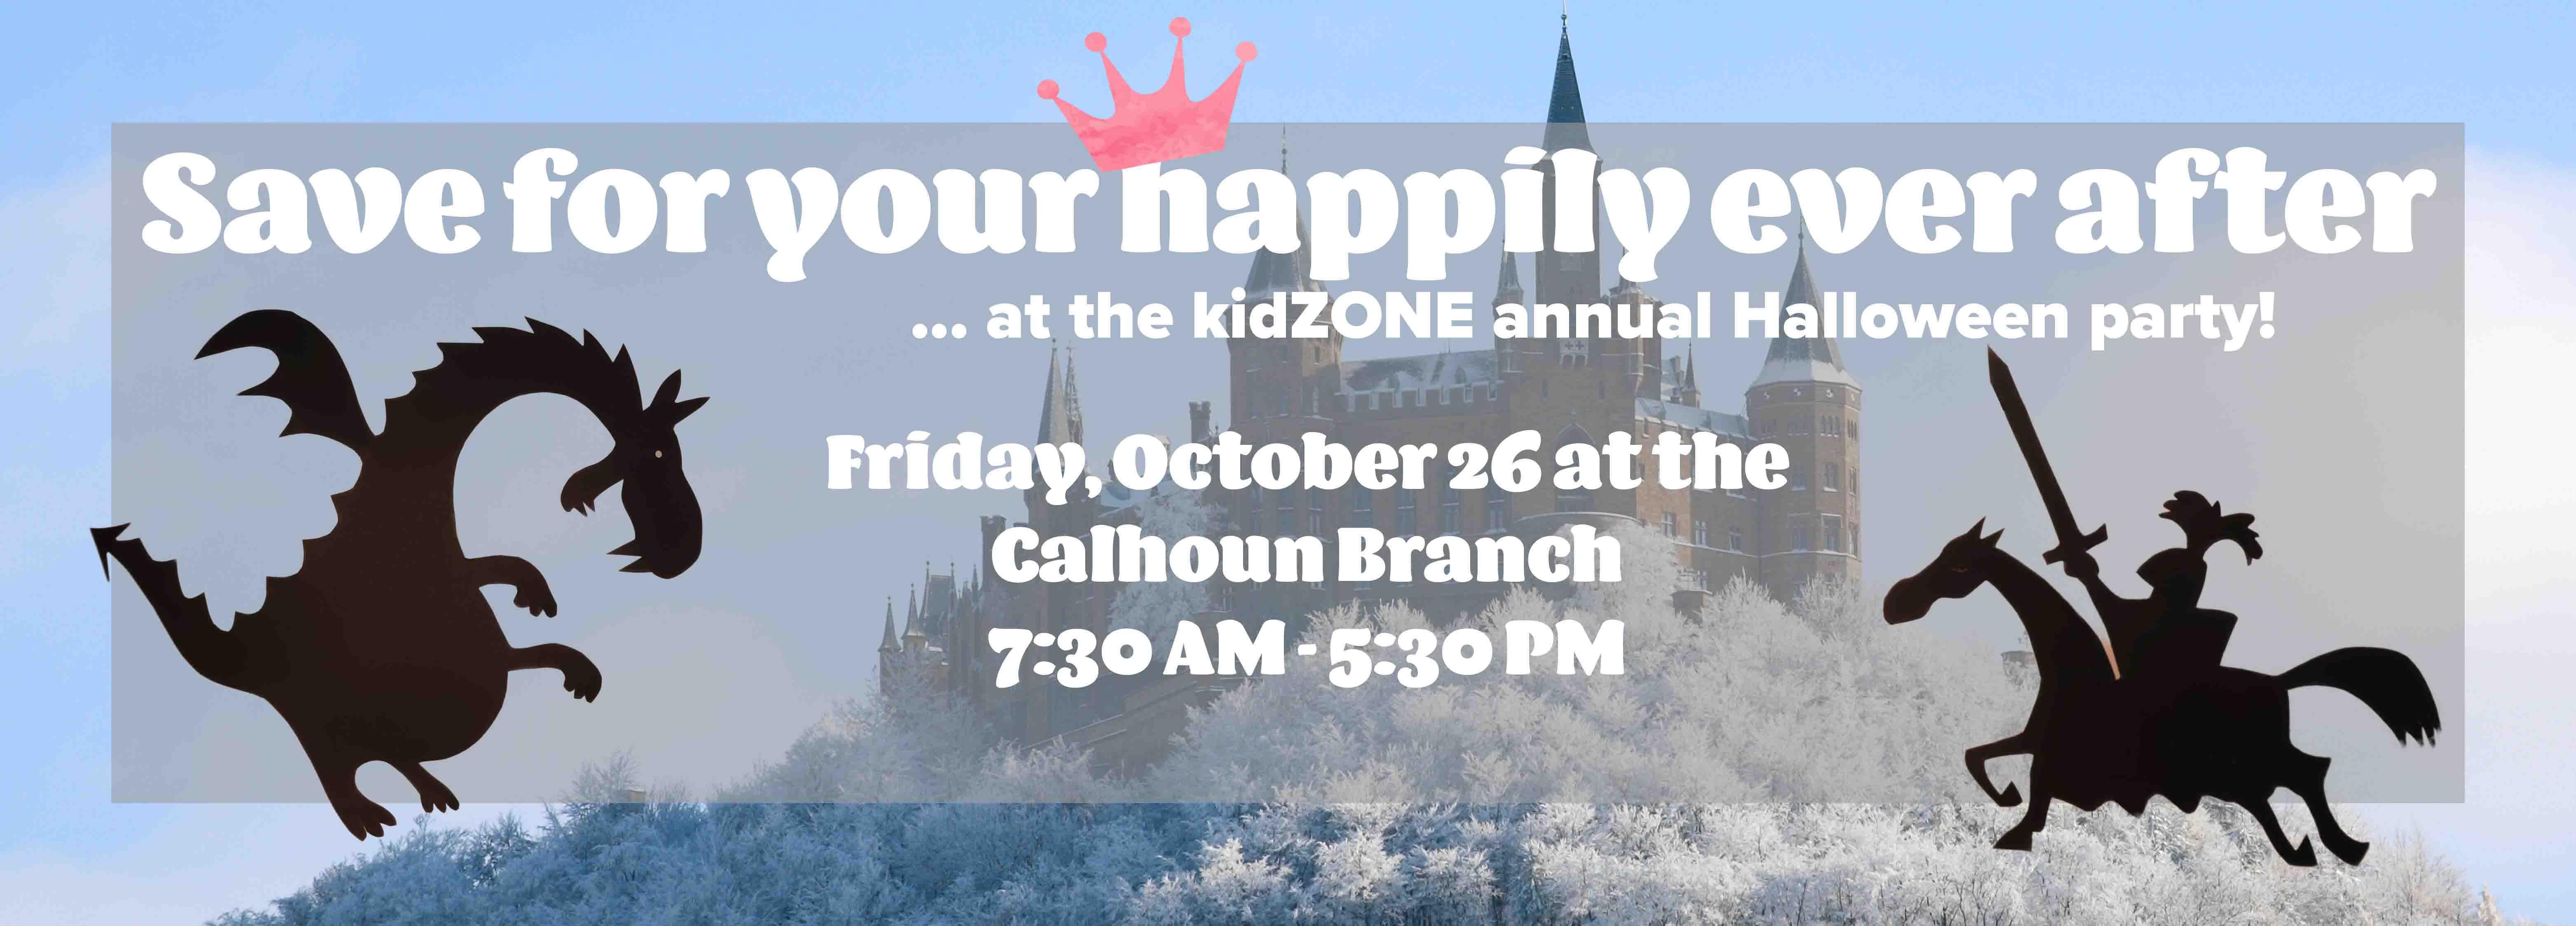 kidZONE Halloween Party - Friday Oct 26!